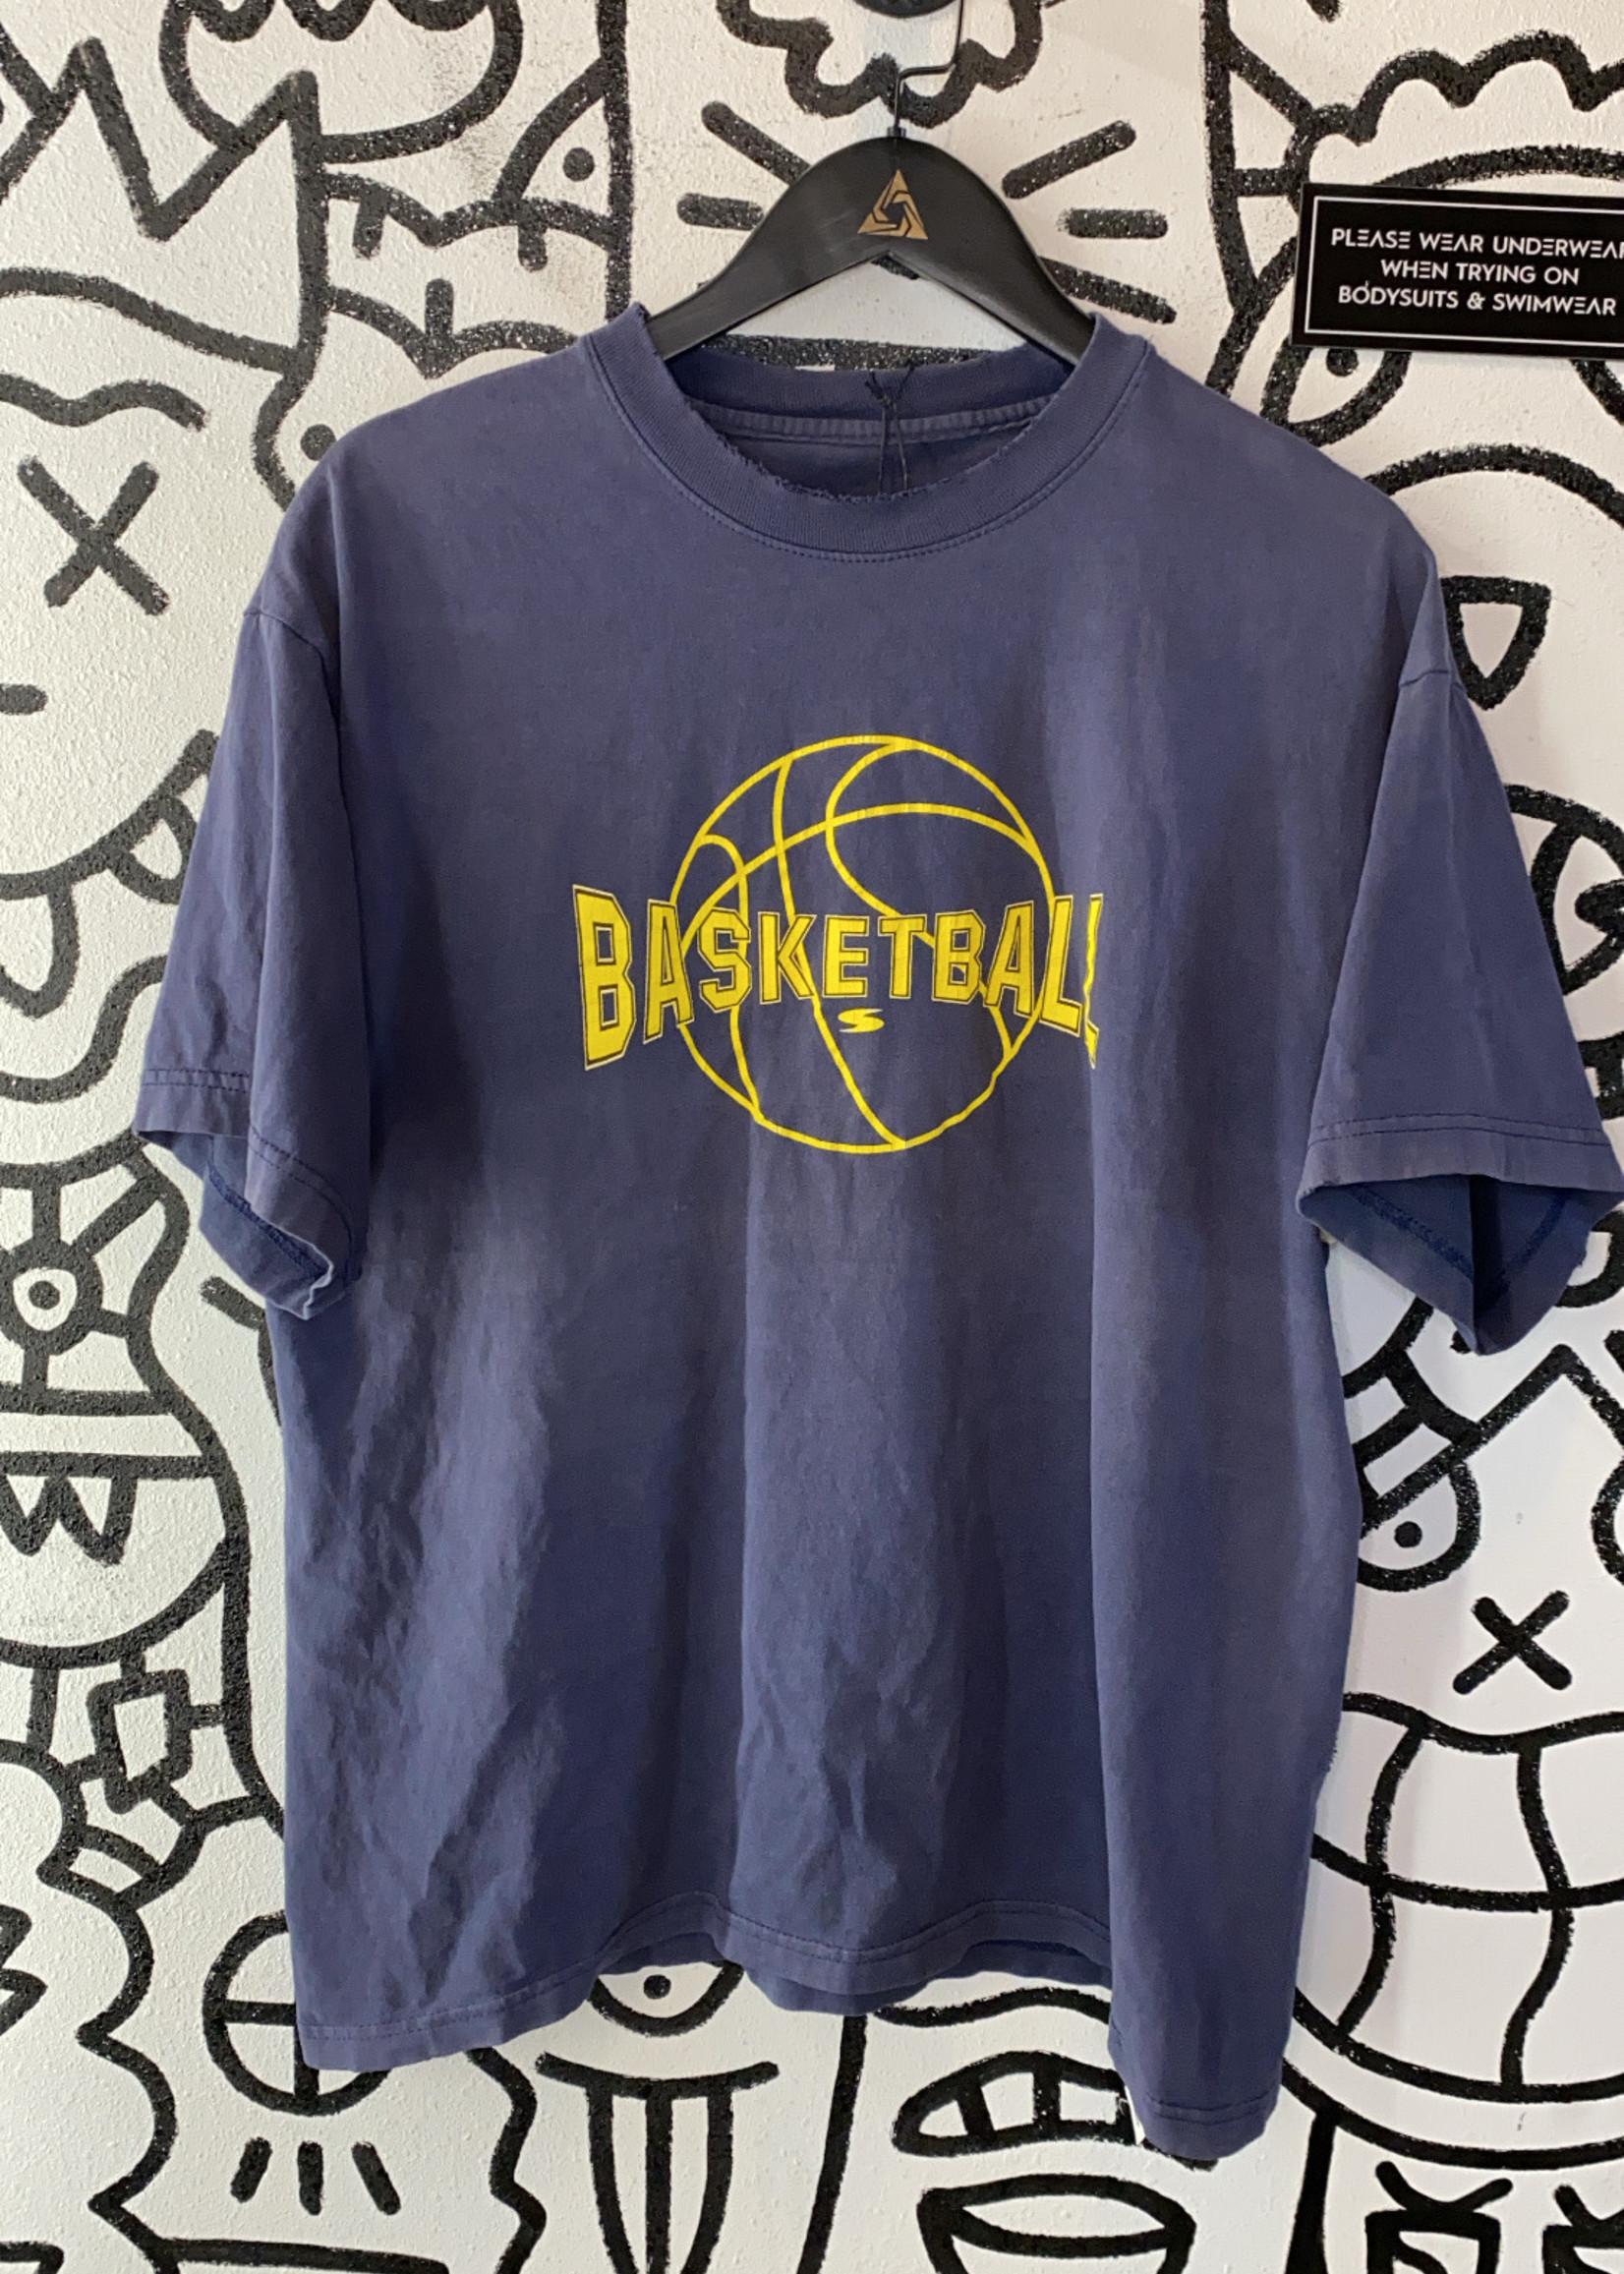 Vintage 90's Navy Blue Basketball Shirt L